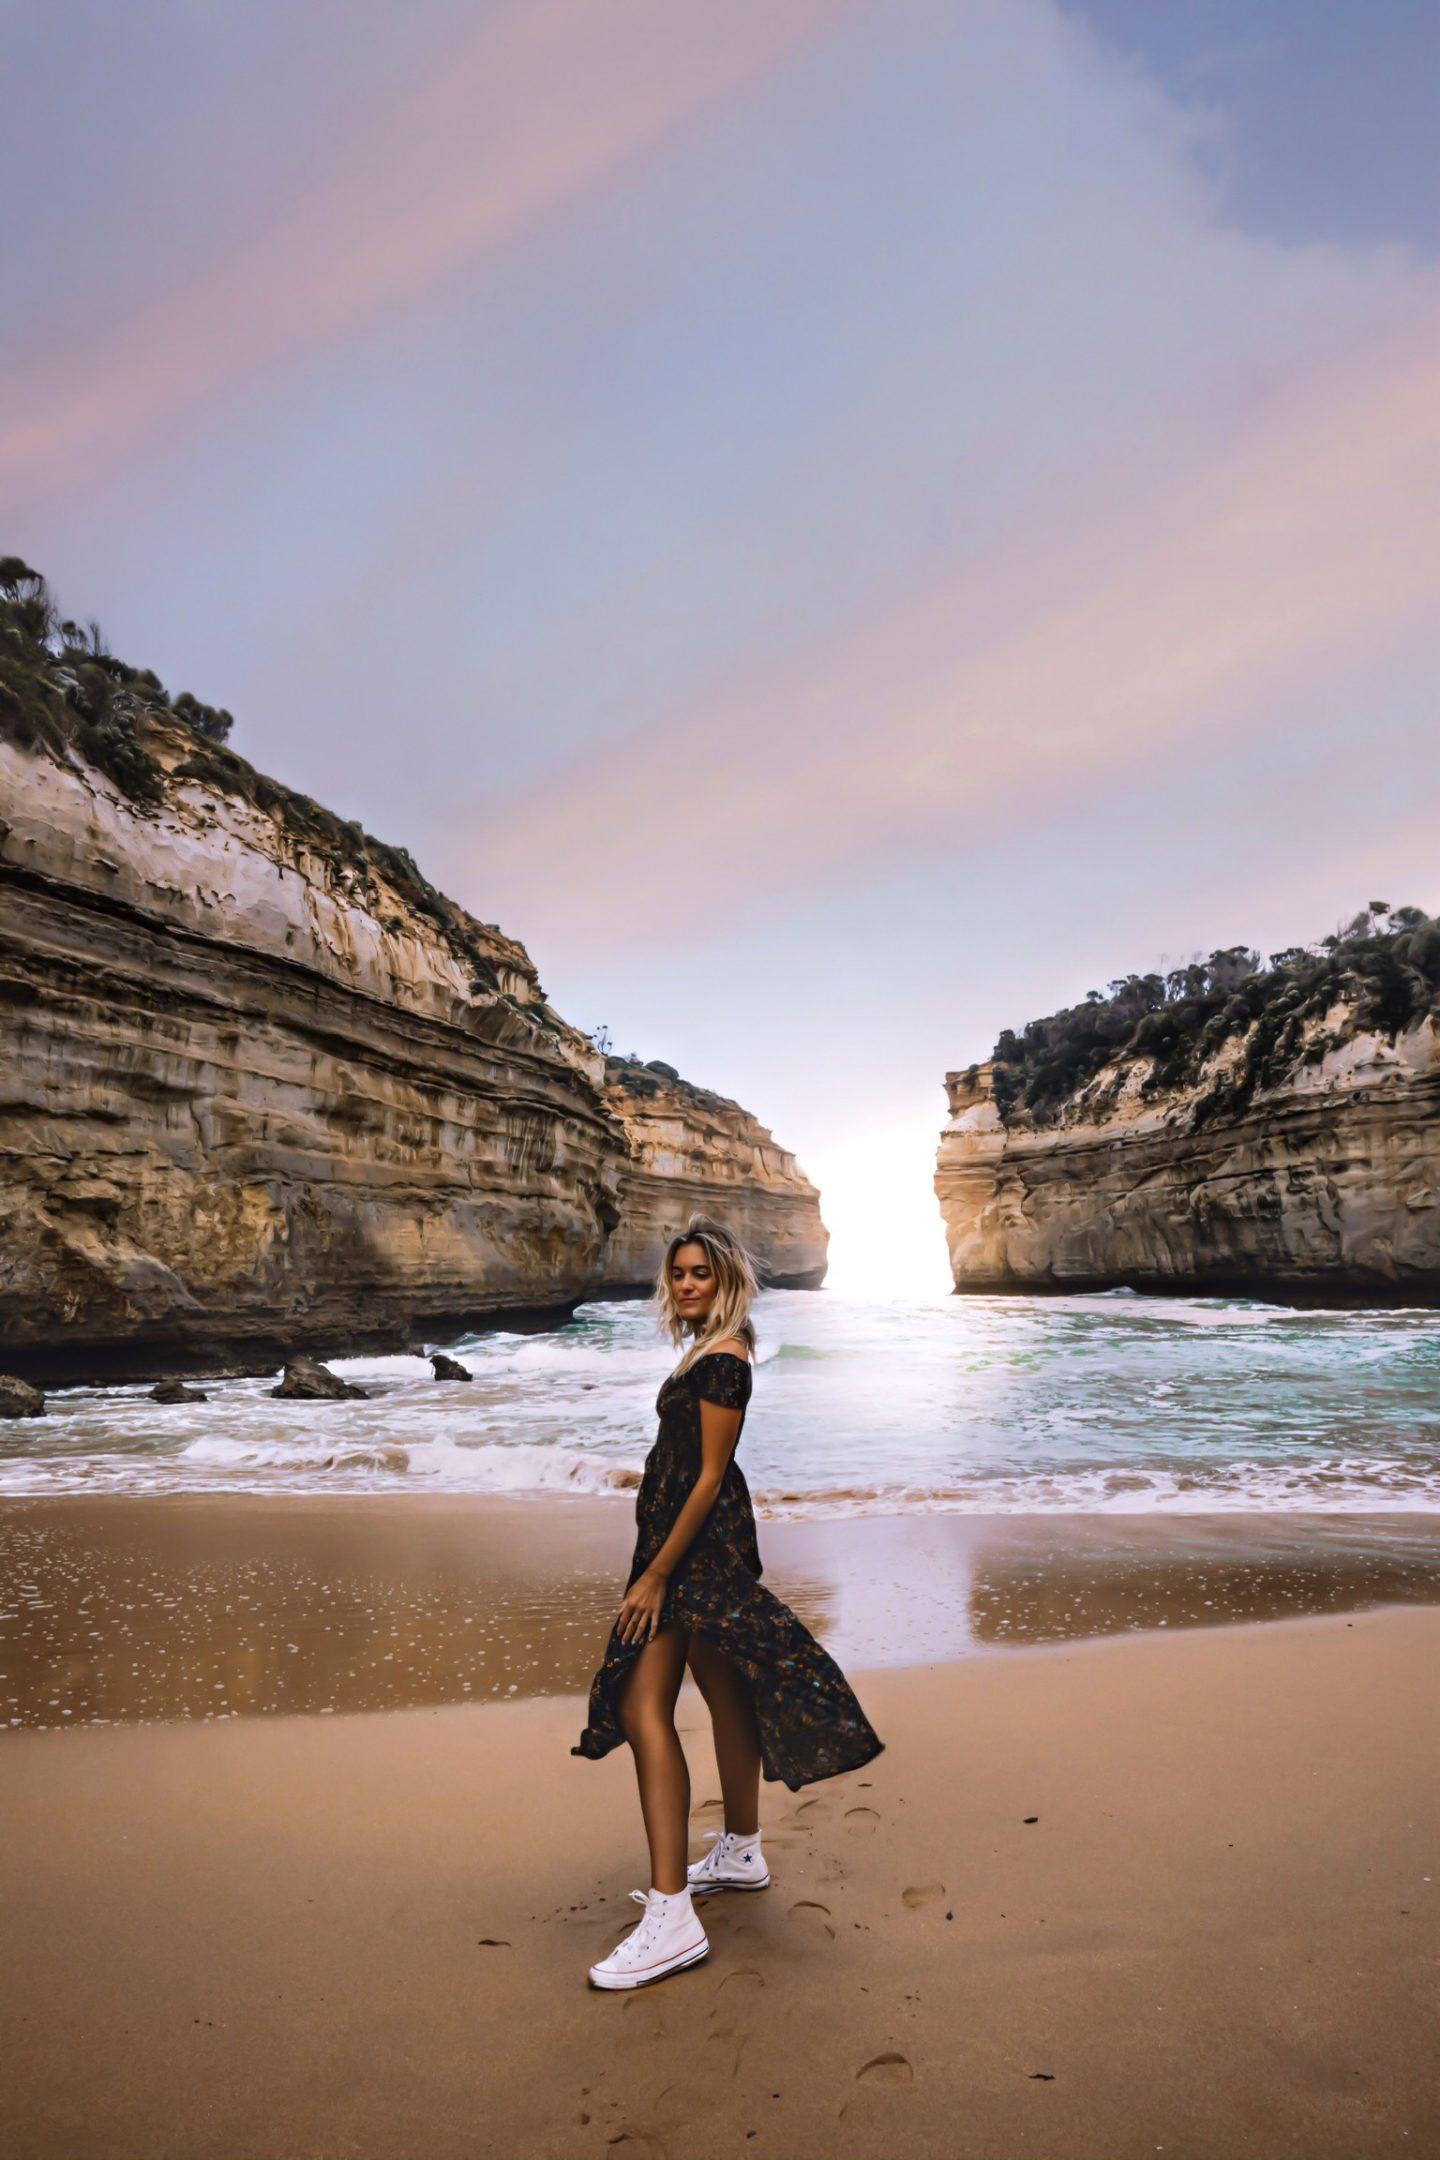 Sunset Great Ocean Road - Blondie Baby blog mode et voyages